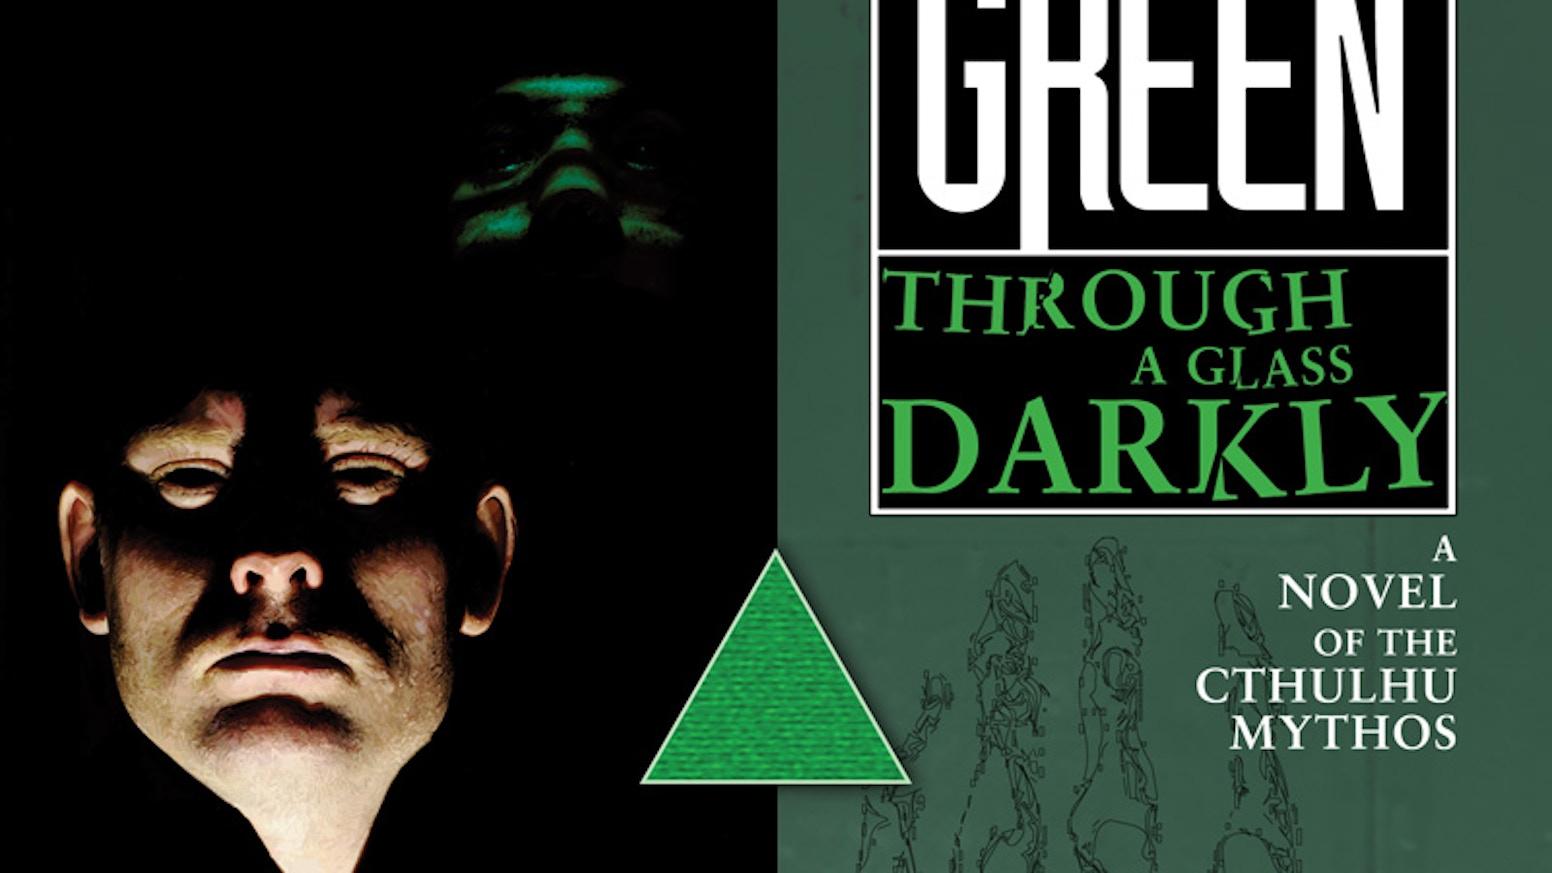 Through a glass darkly a new delta green novel by arc dream through a glass darkly a new delta green novel fandeluxe Images